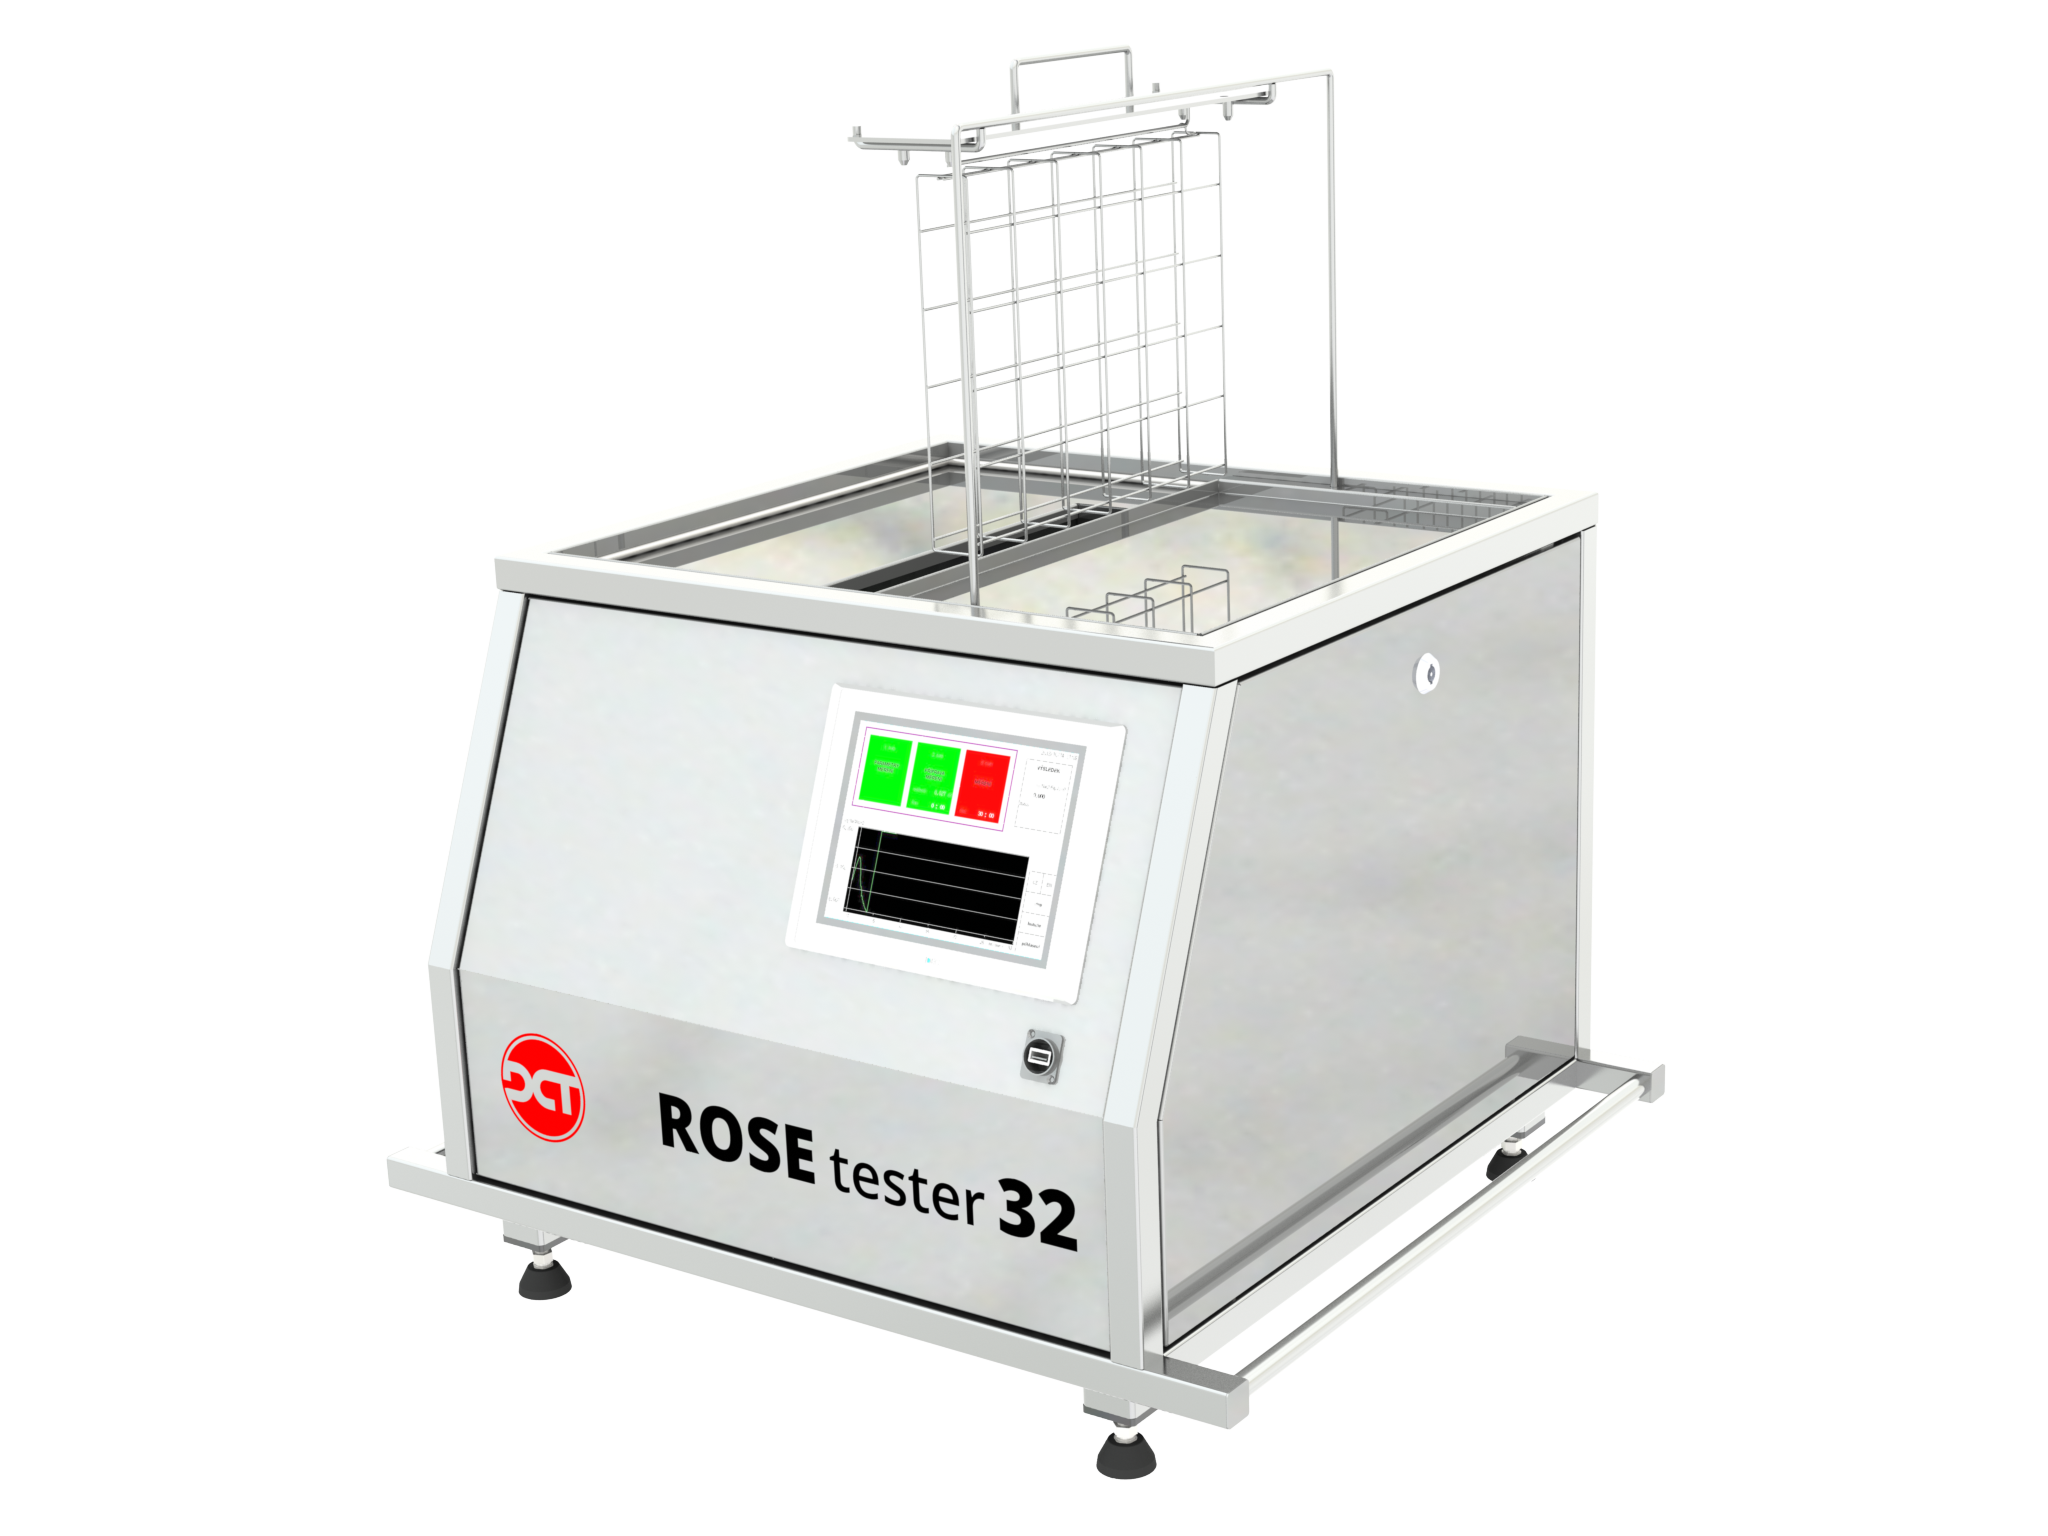 ROSE tester 32